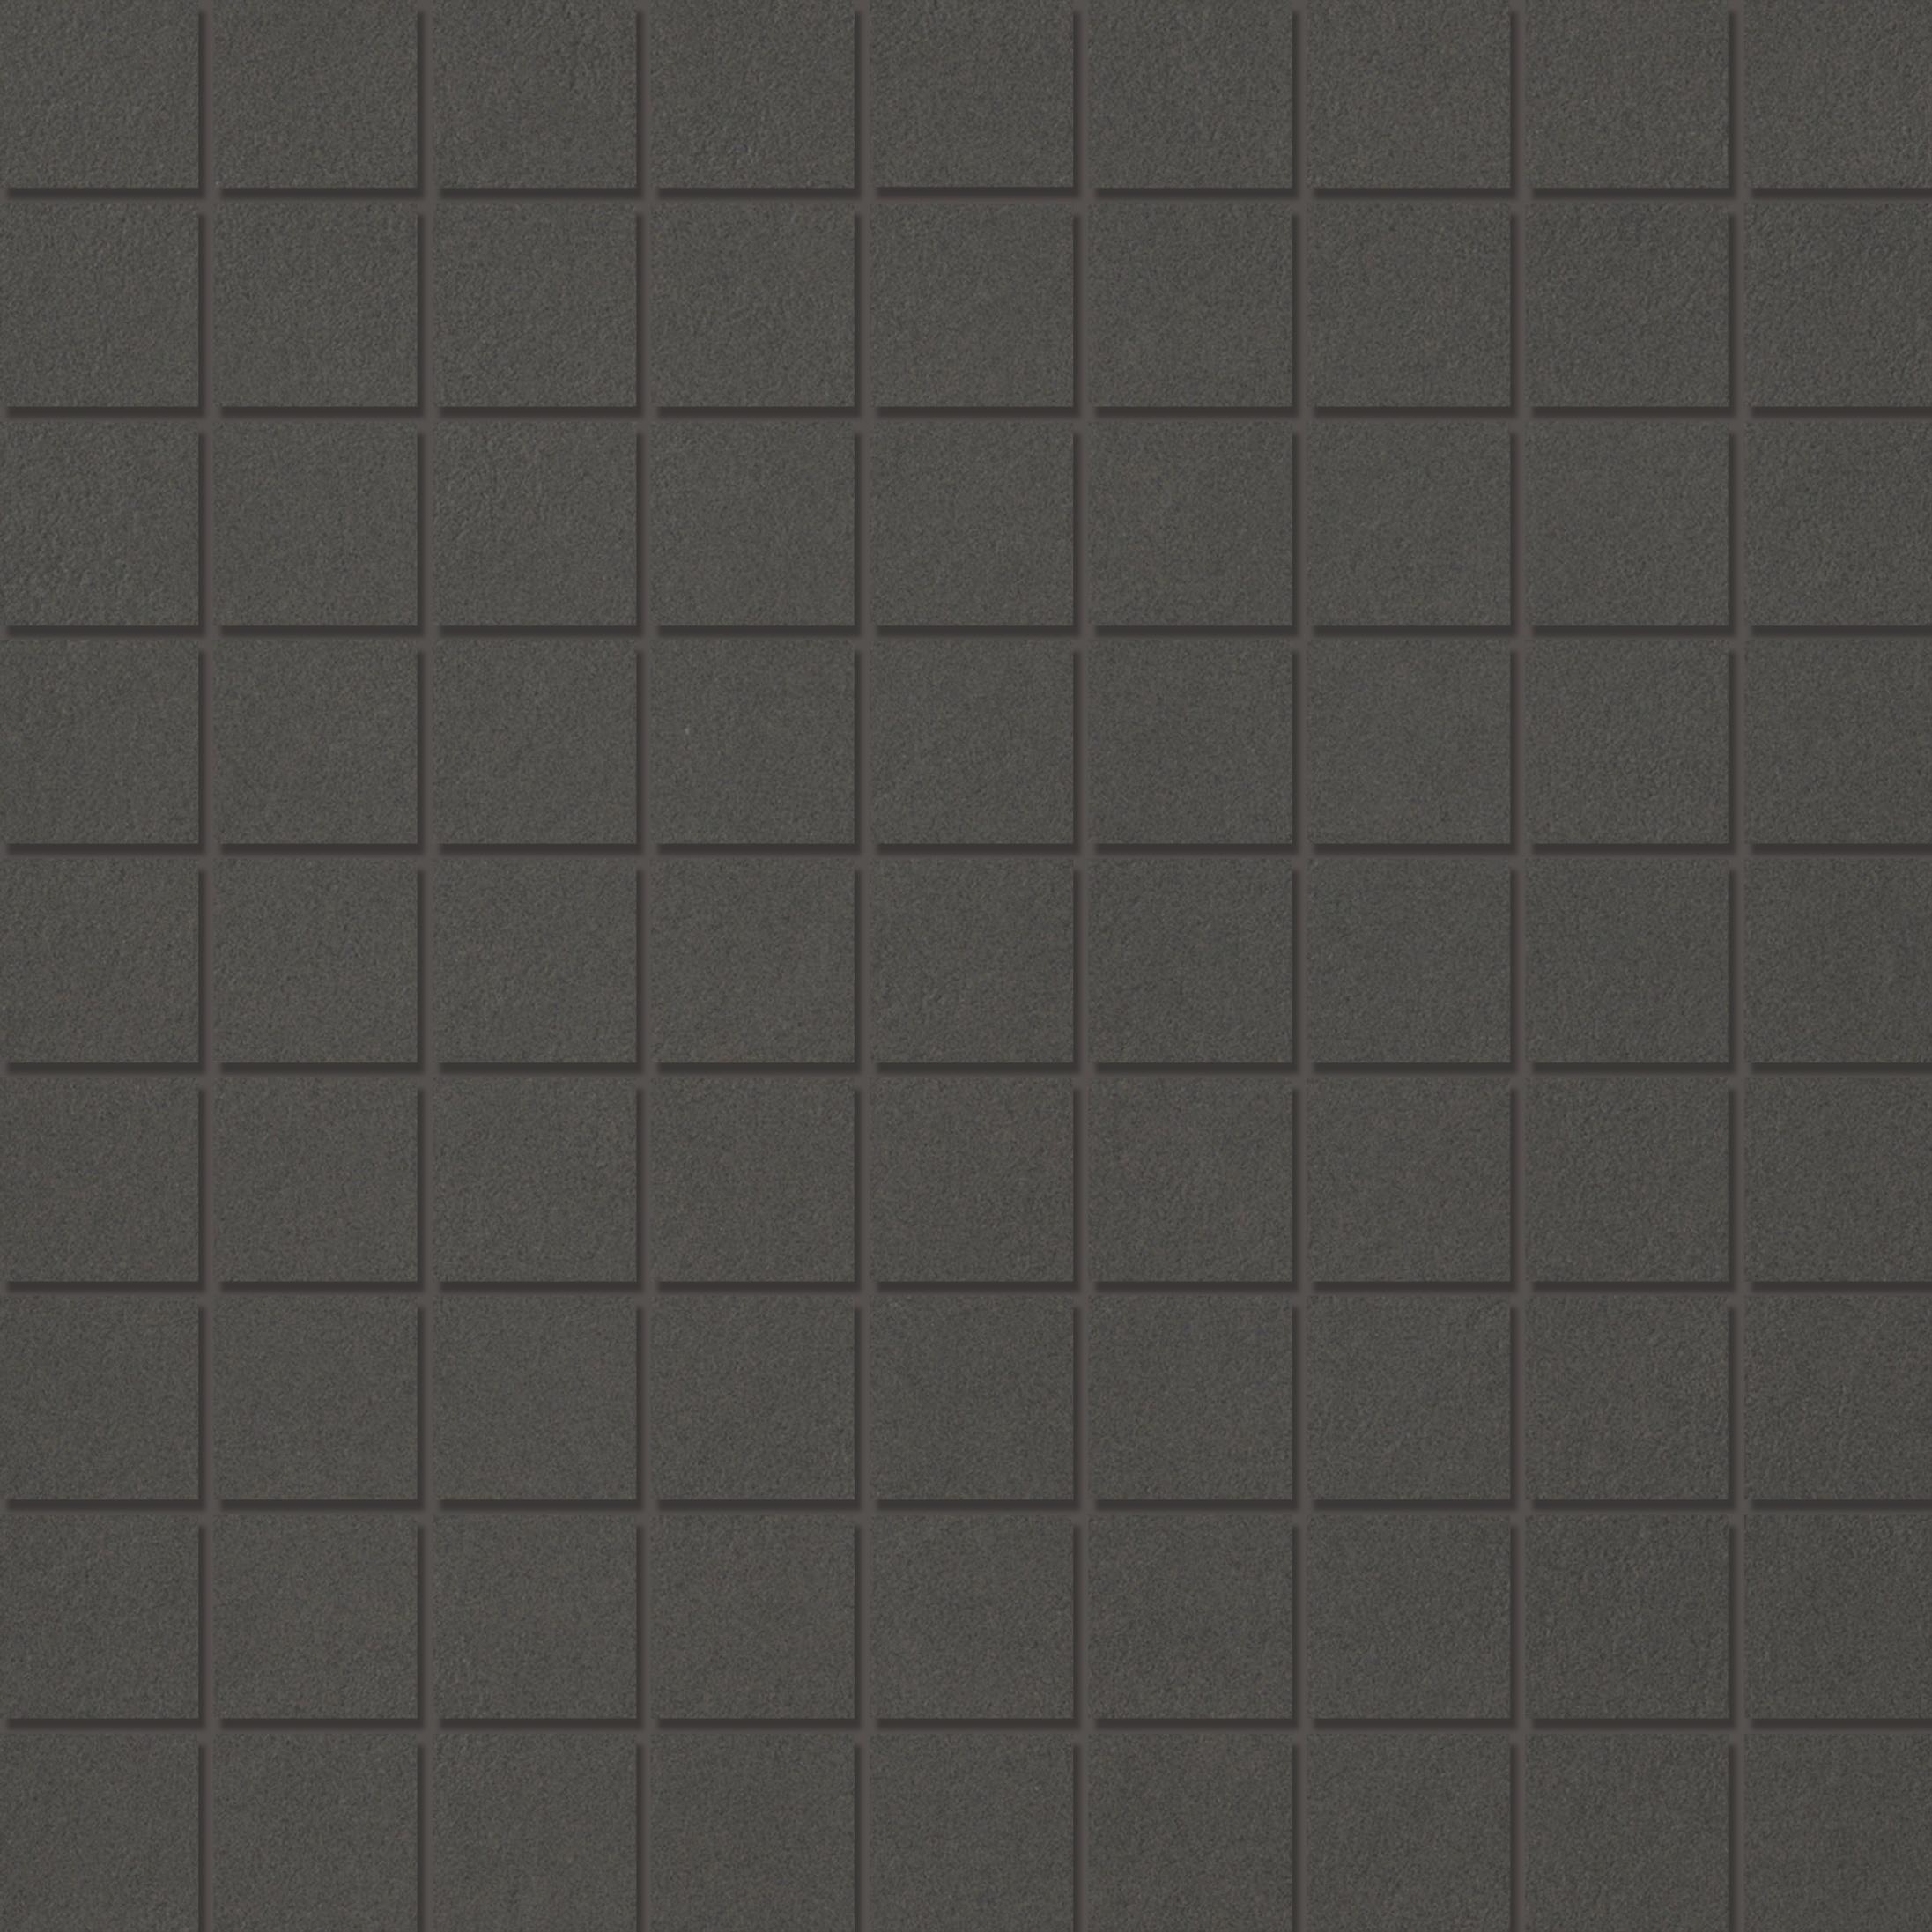 Mosaic 3,1X3,1 Dark Brown